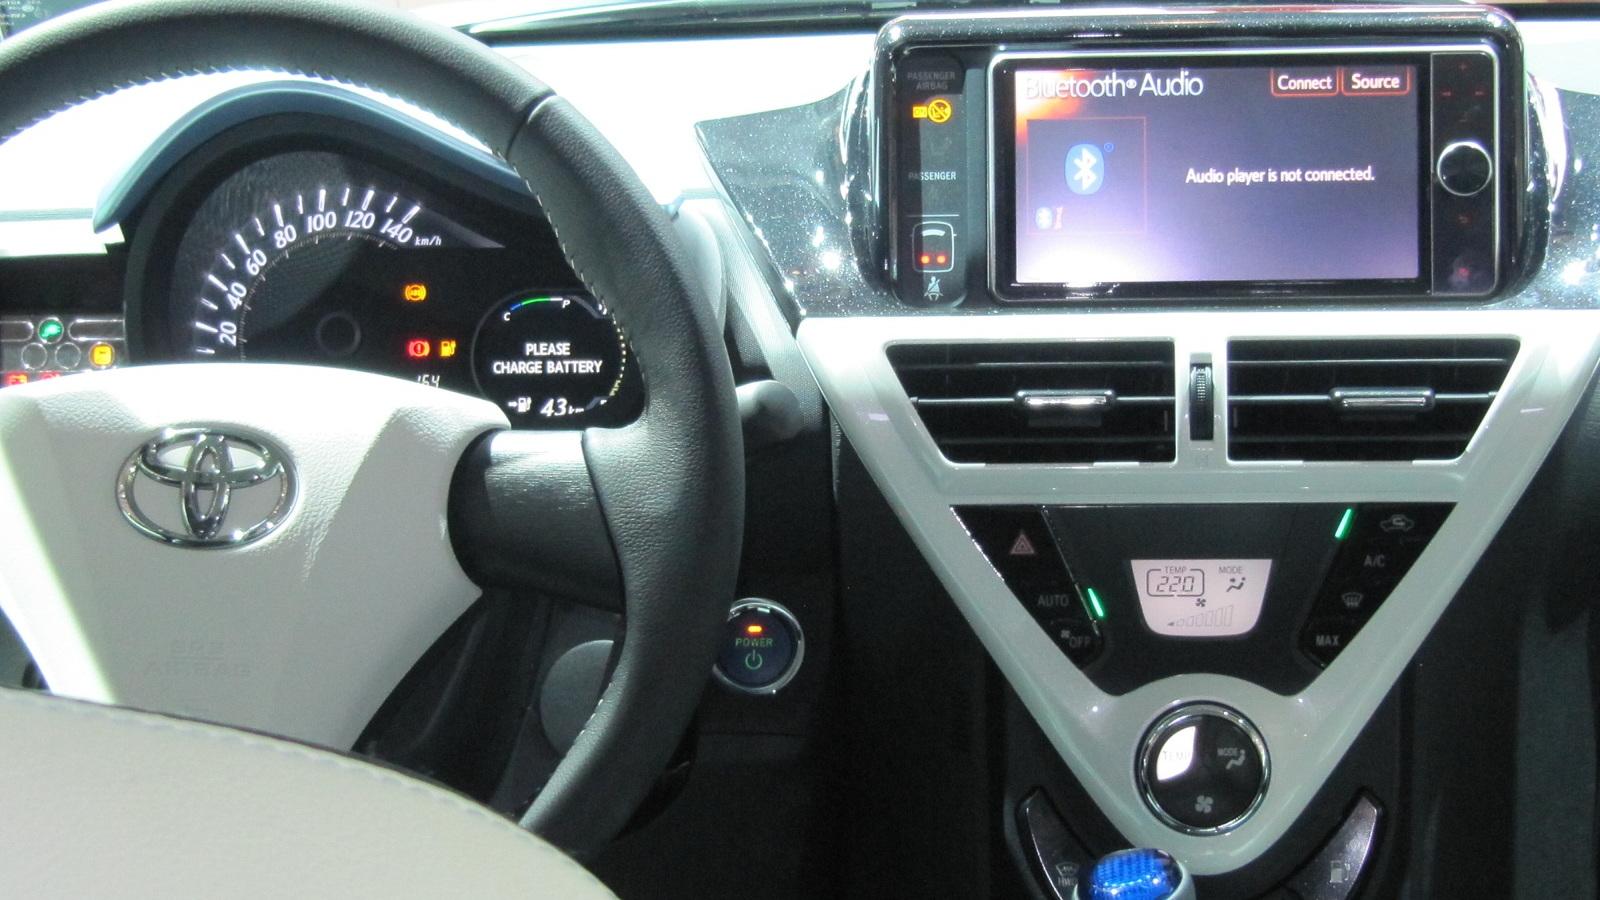 Toyota iQ EV electric car at 2012 Paris Auto Show